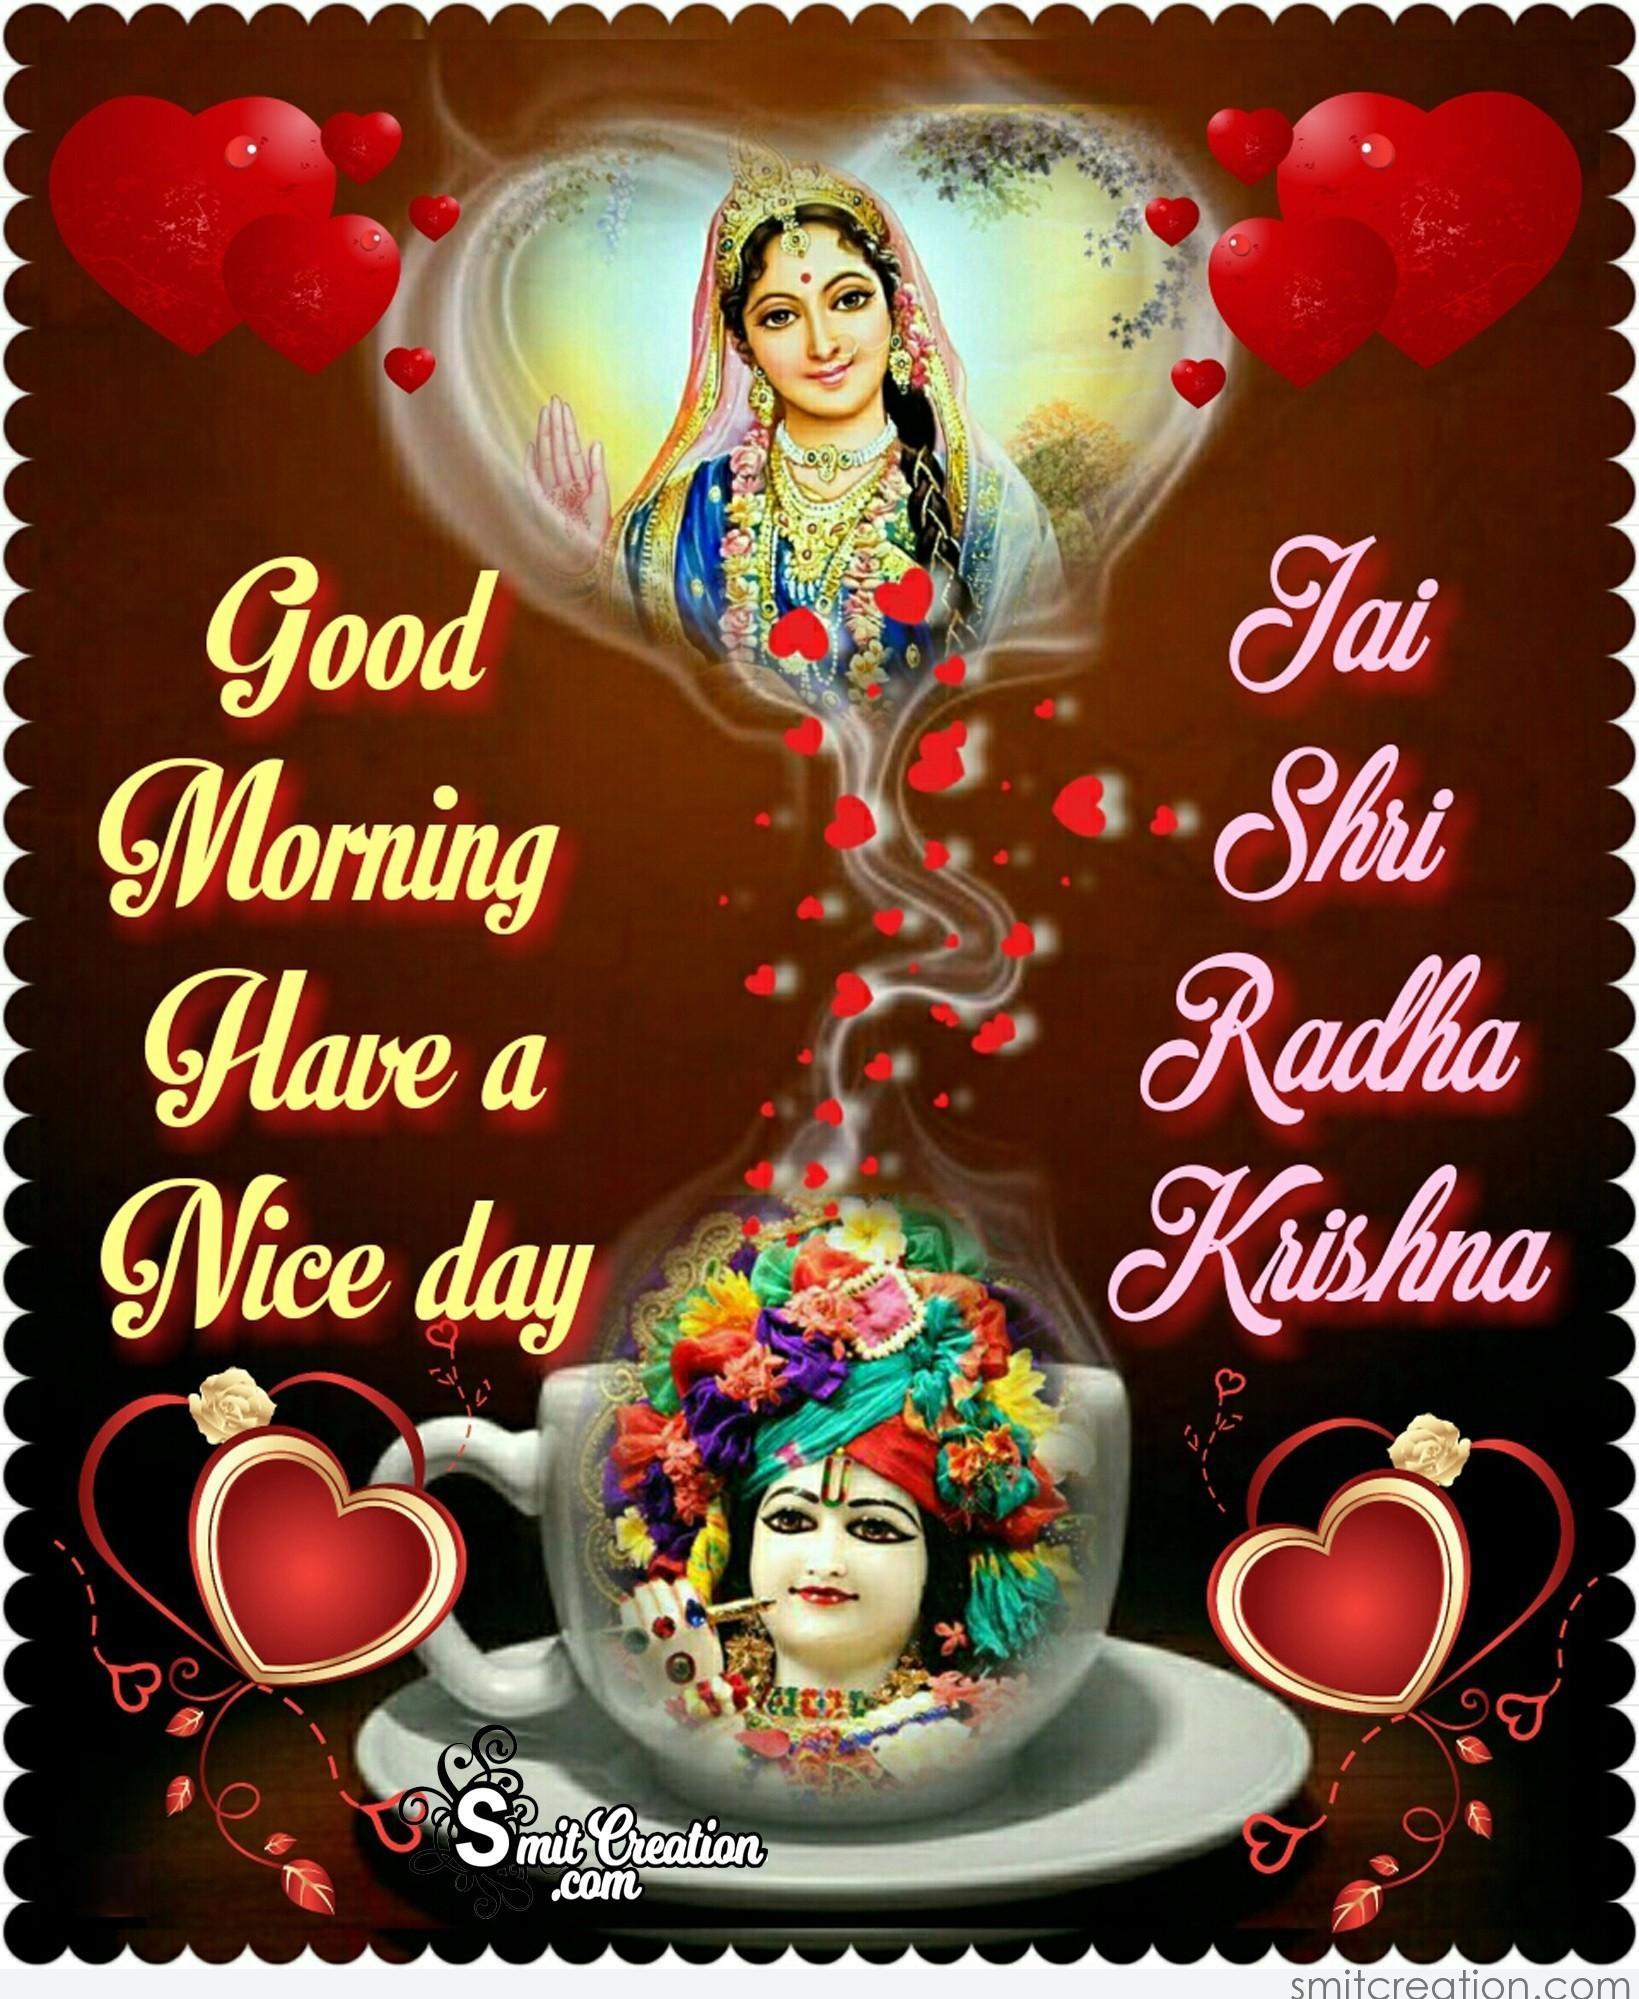 Radha Krishna Good Morning Pictures And Graphics Smitcreationcom